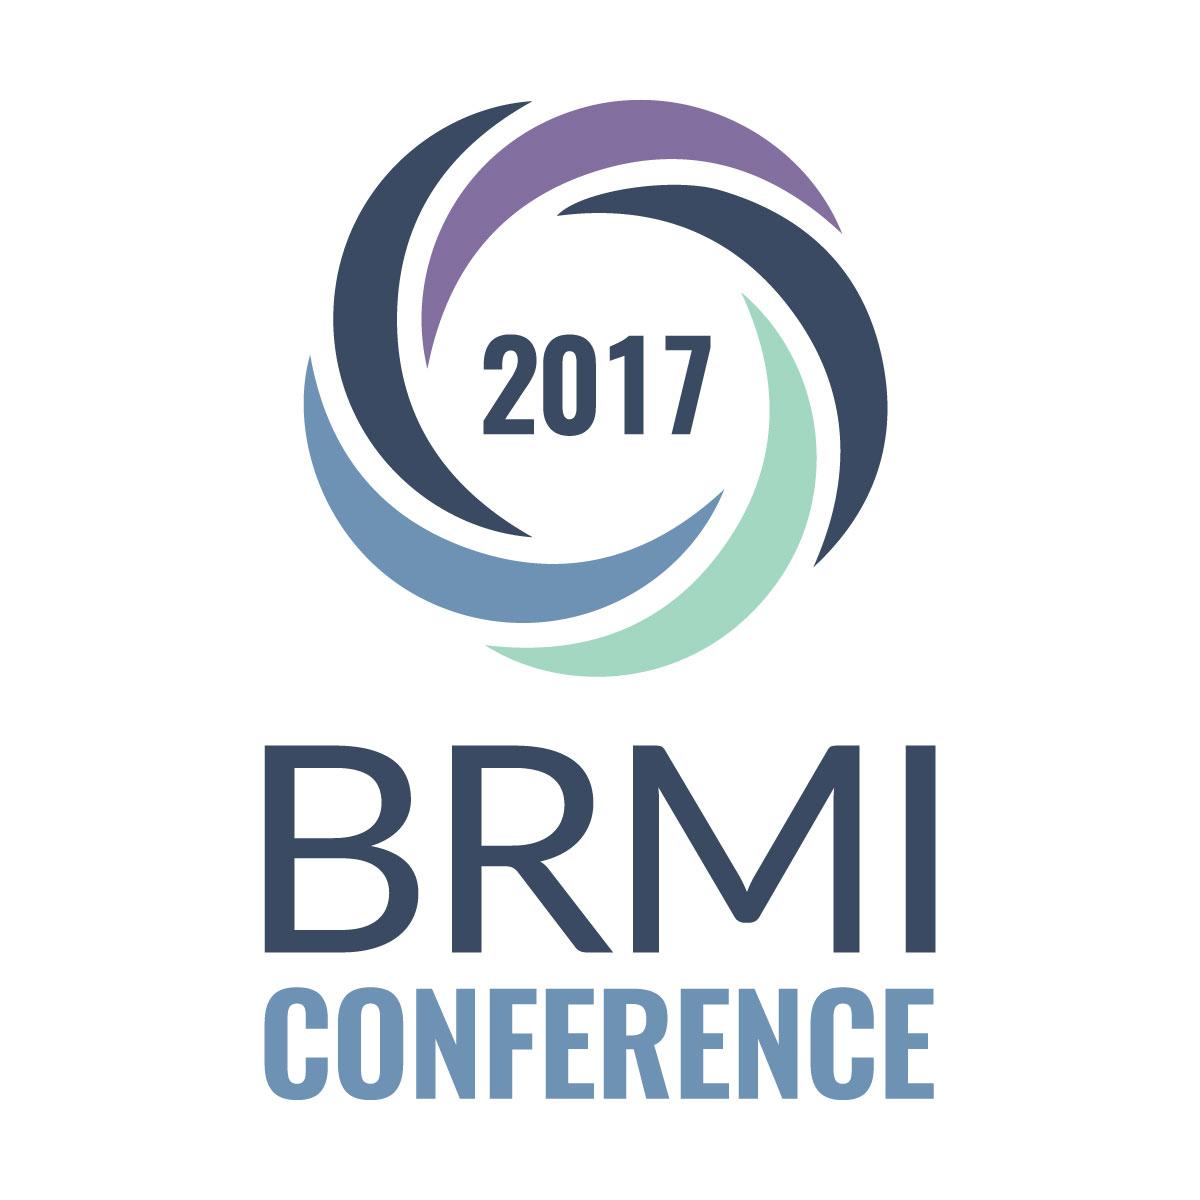 BRMI Conference2017 Logo Vertical Color